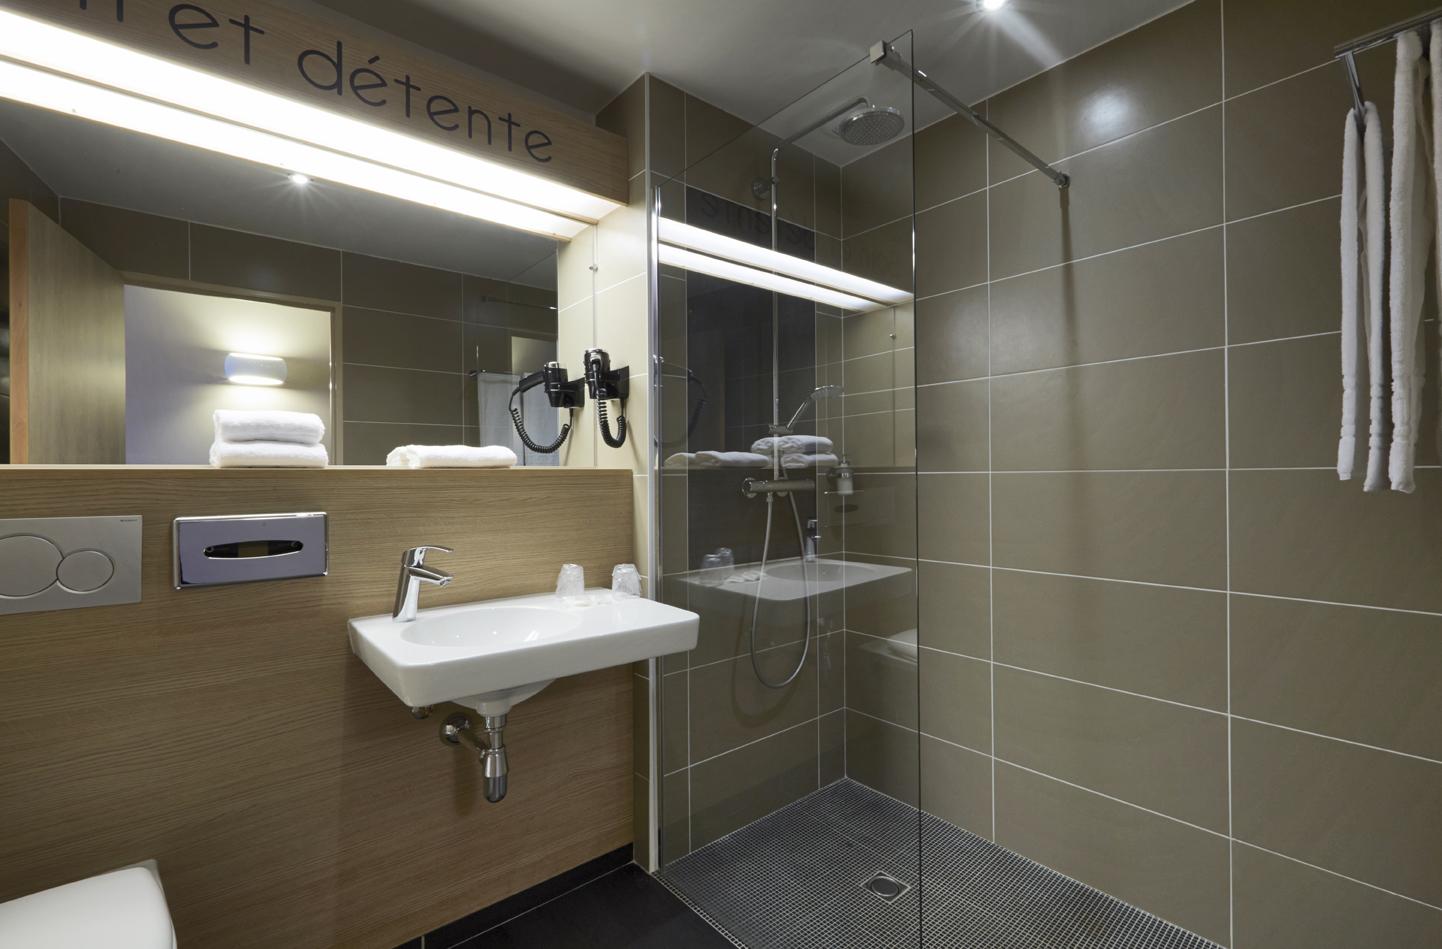 hotel kyriad angers beaucouze - géraldine fourny - decoratrice d interieur nantes 44 - décoration hotel 4